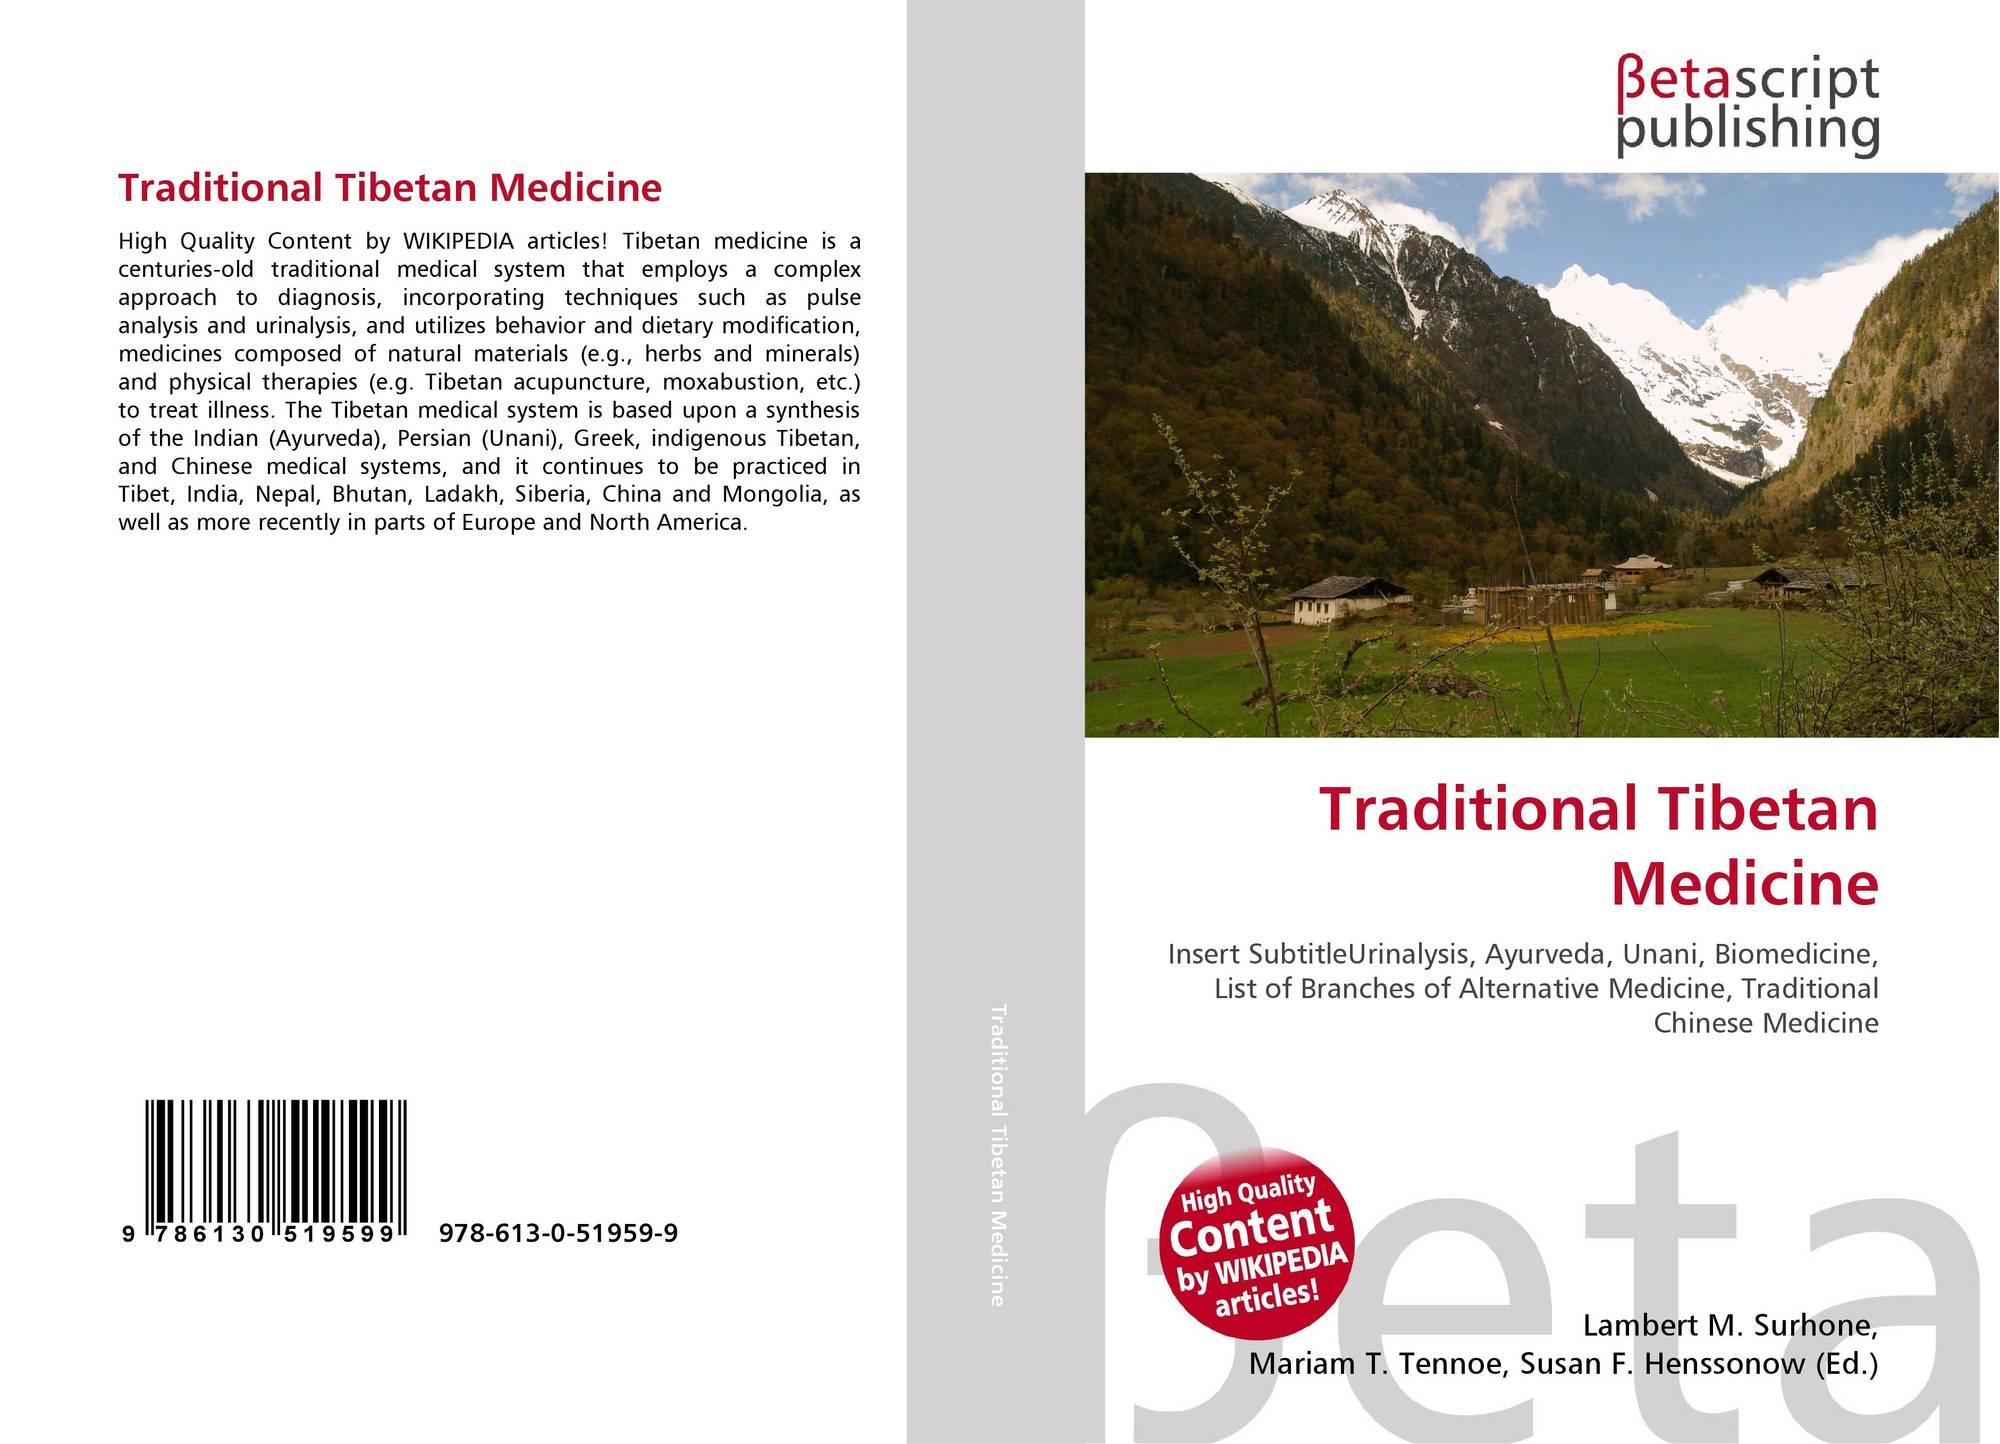 Traditional Tibetan Medicine, 978-613-0-51959-9, 6130519591